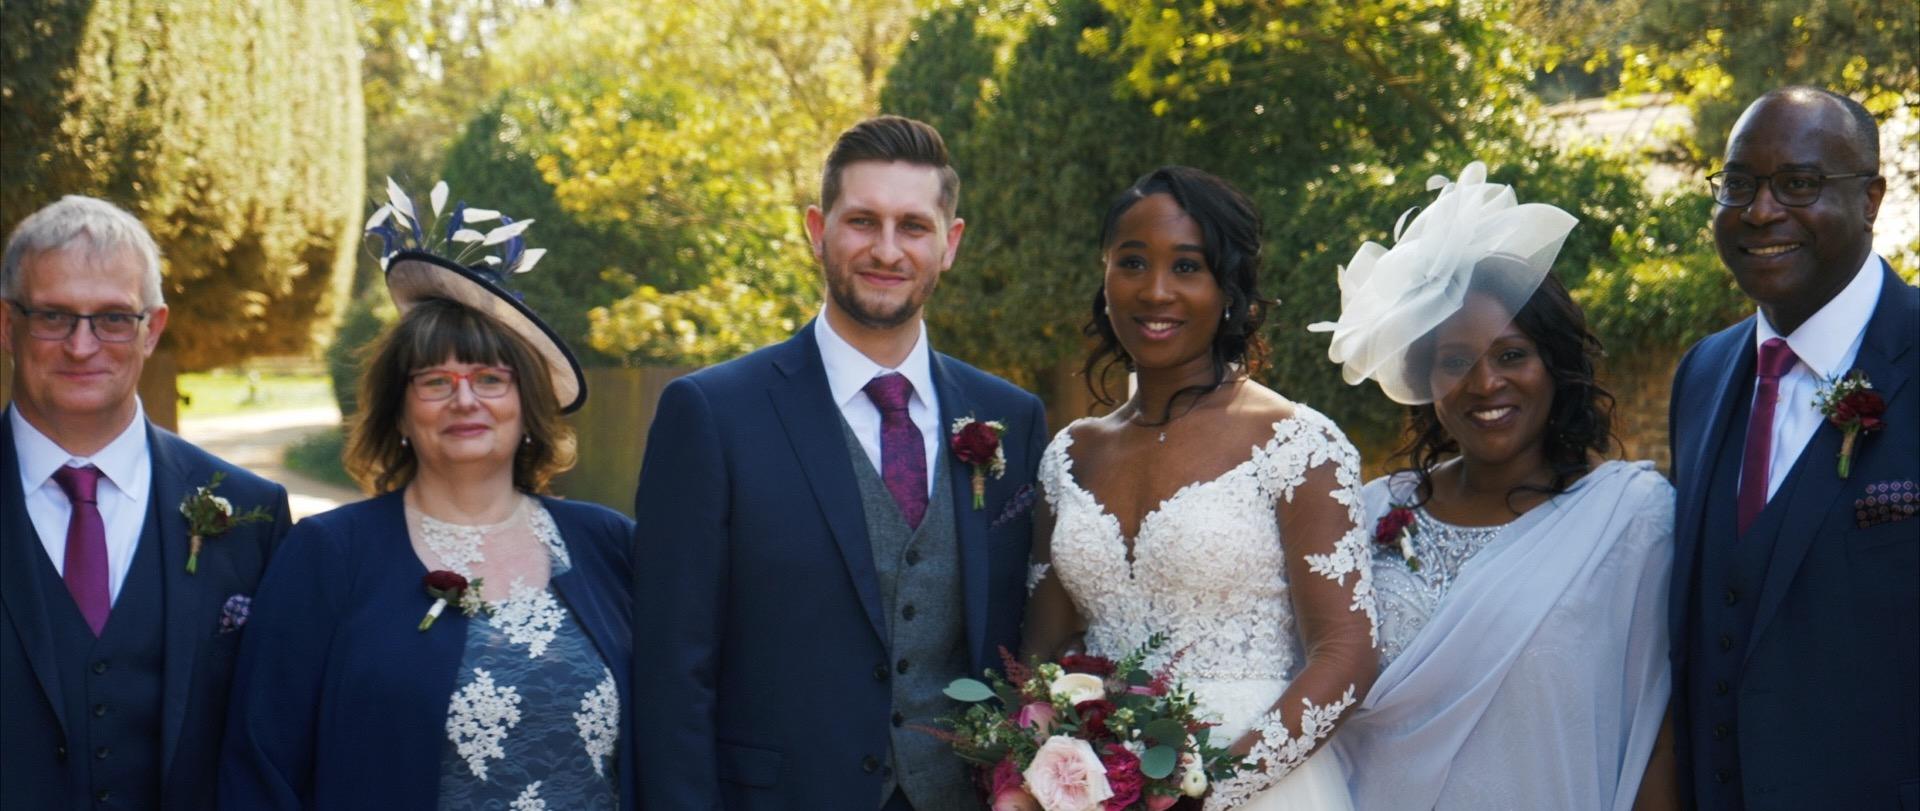 Gaynes Park Family Photos Video.jpg